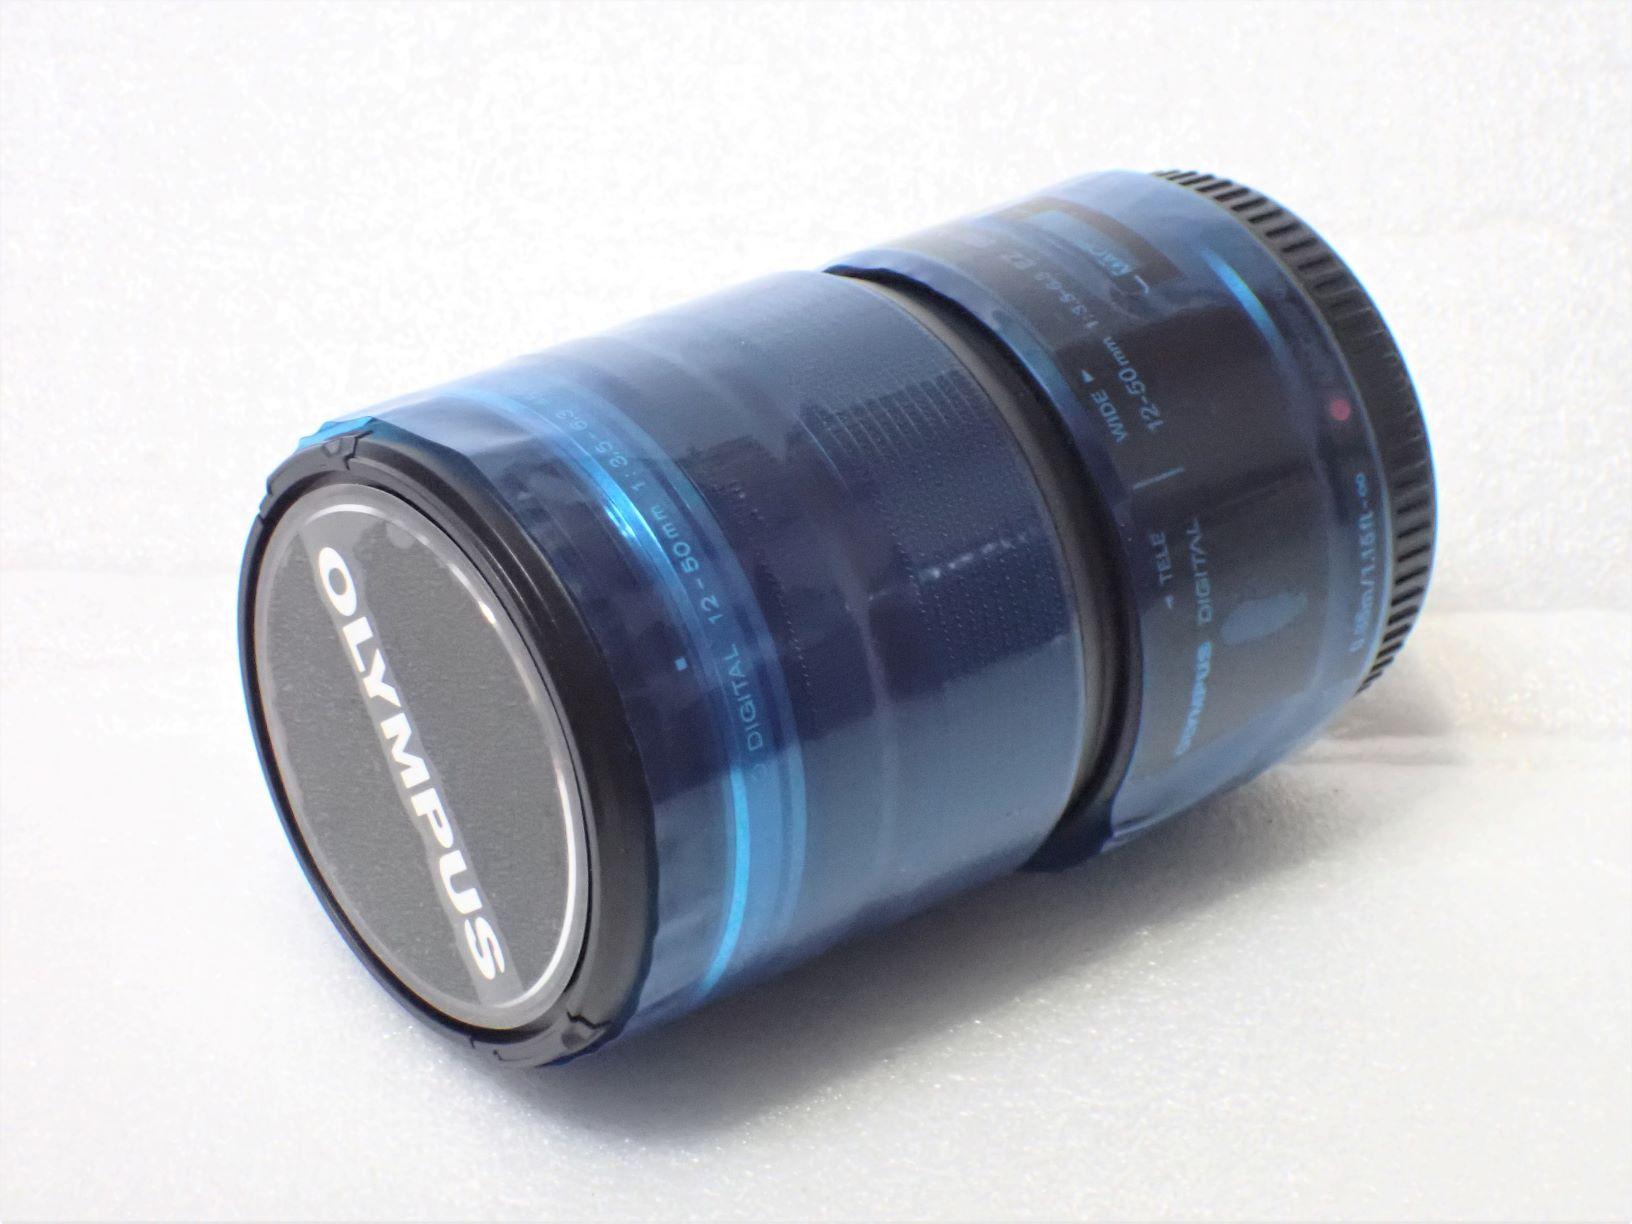 OLYMPUS M.ZUIKO DIGITAL ED 12-50mm F3.5-6.3 EZ ED MSC レンズ